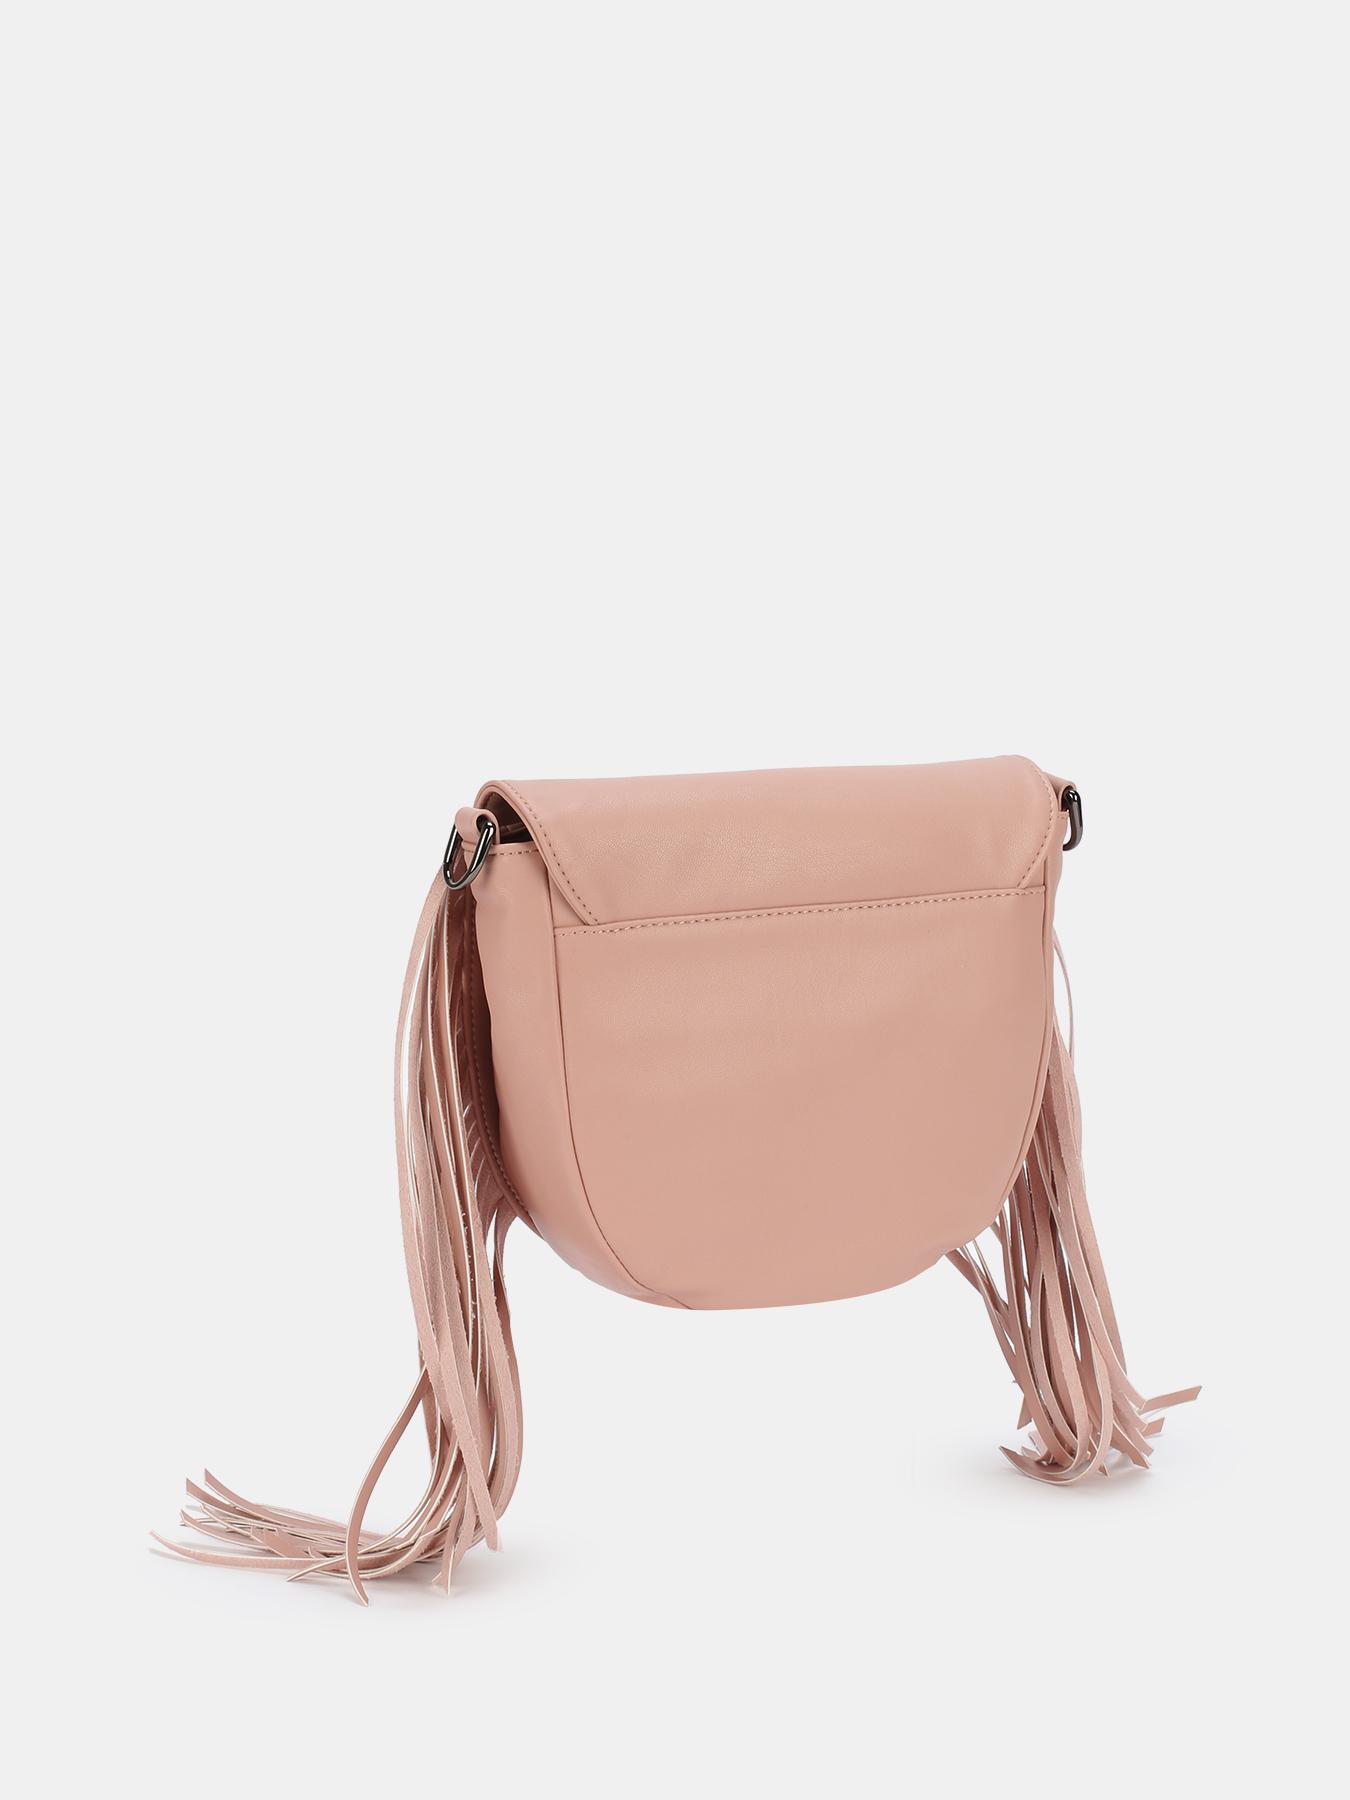 Фото - Сумка Trussardi Jeans Женская сумка сумка женская 29 4e 001 8 цвет светло серый